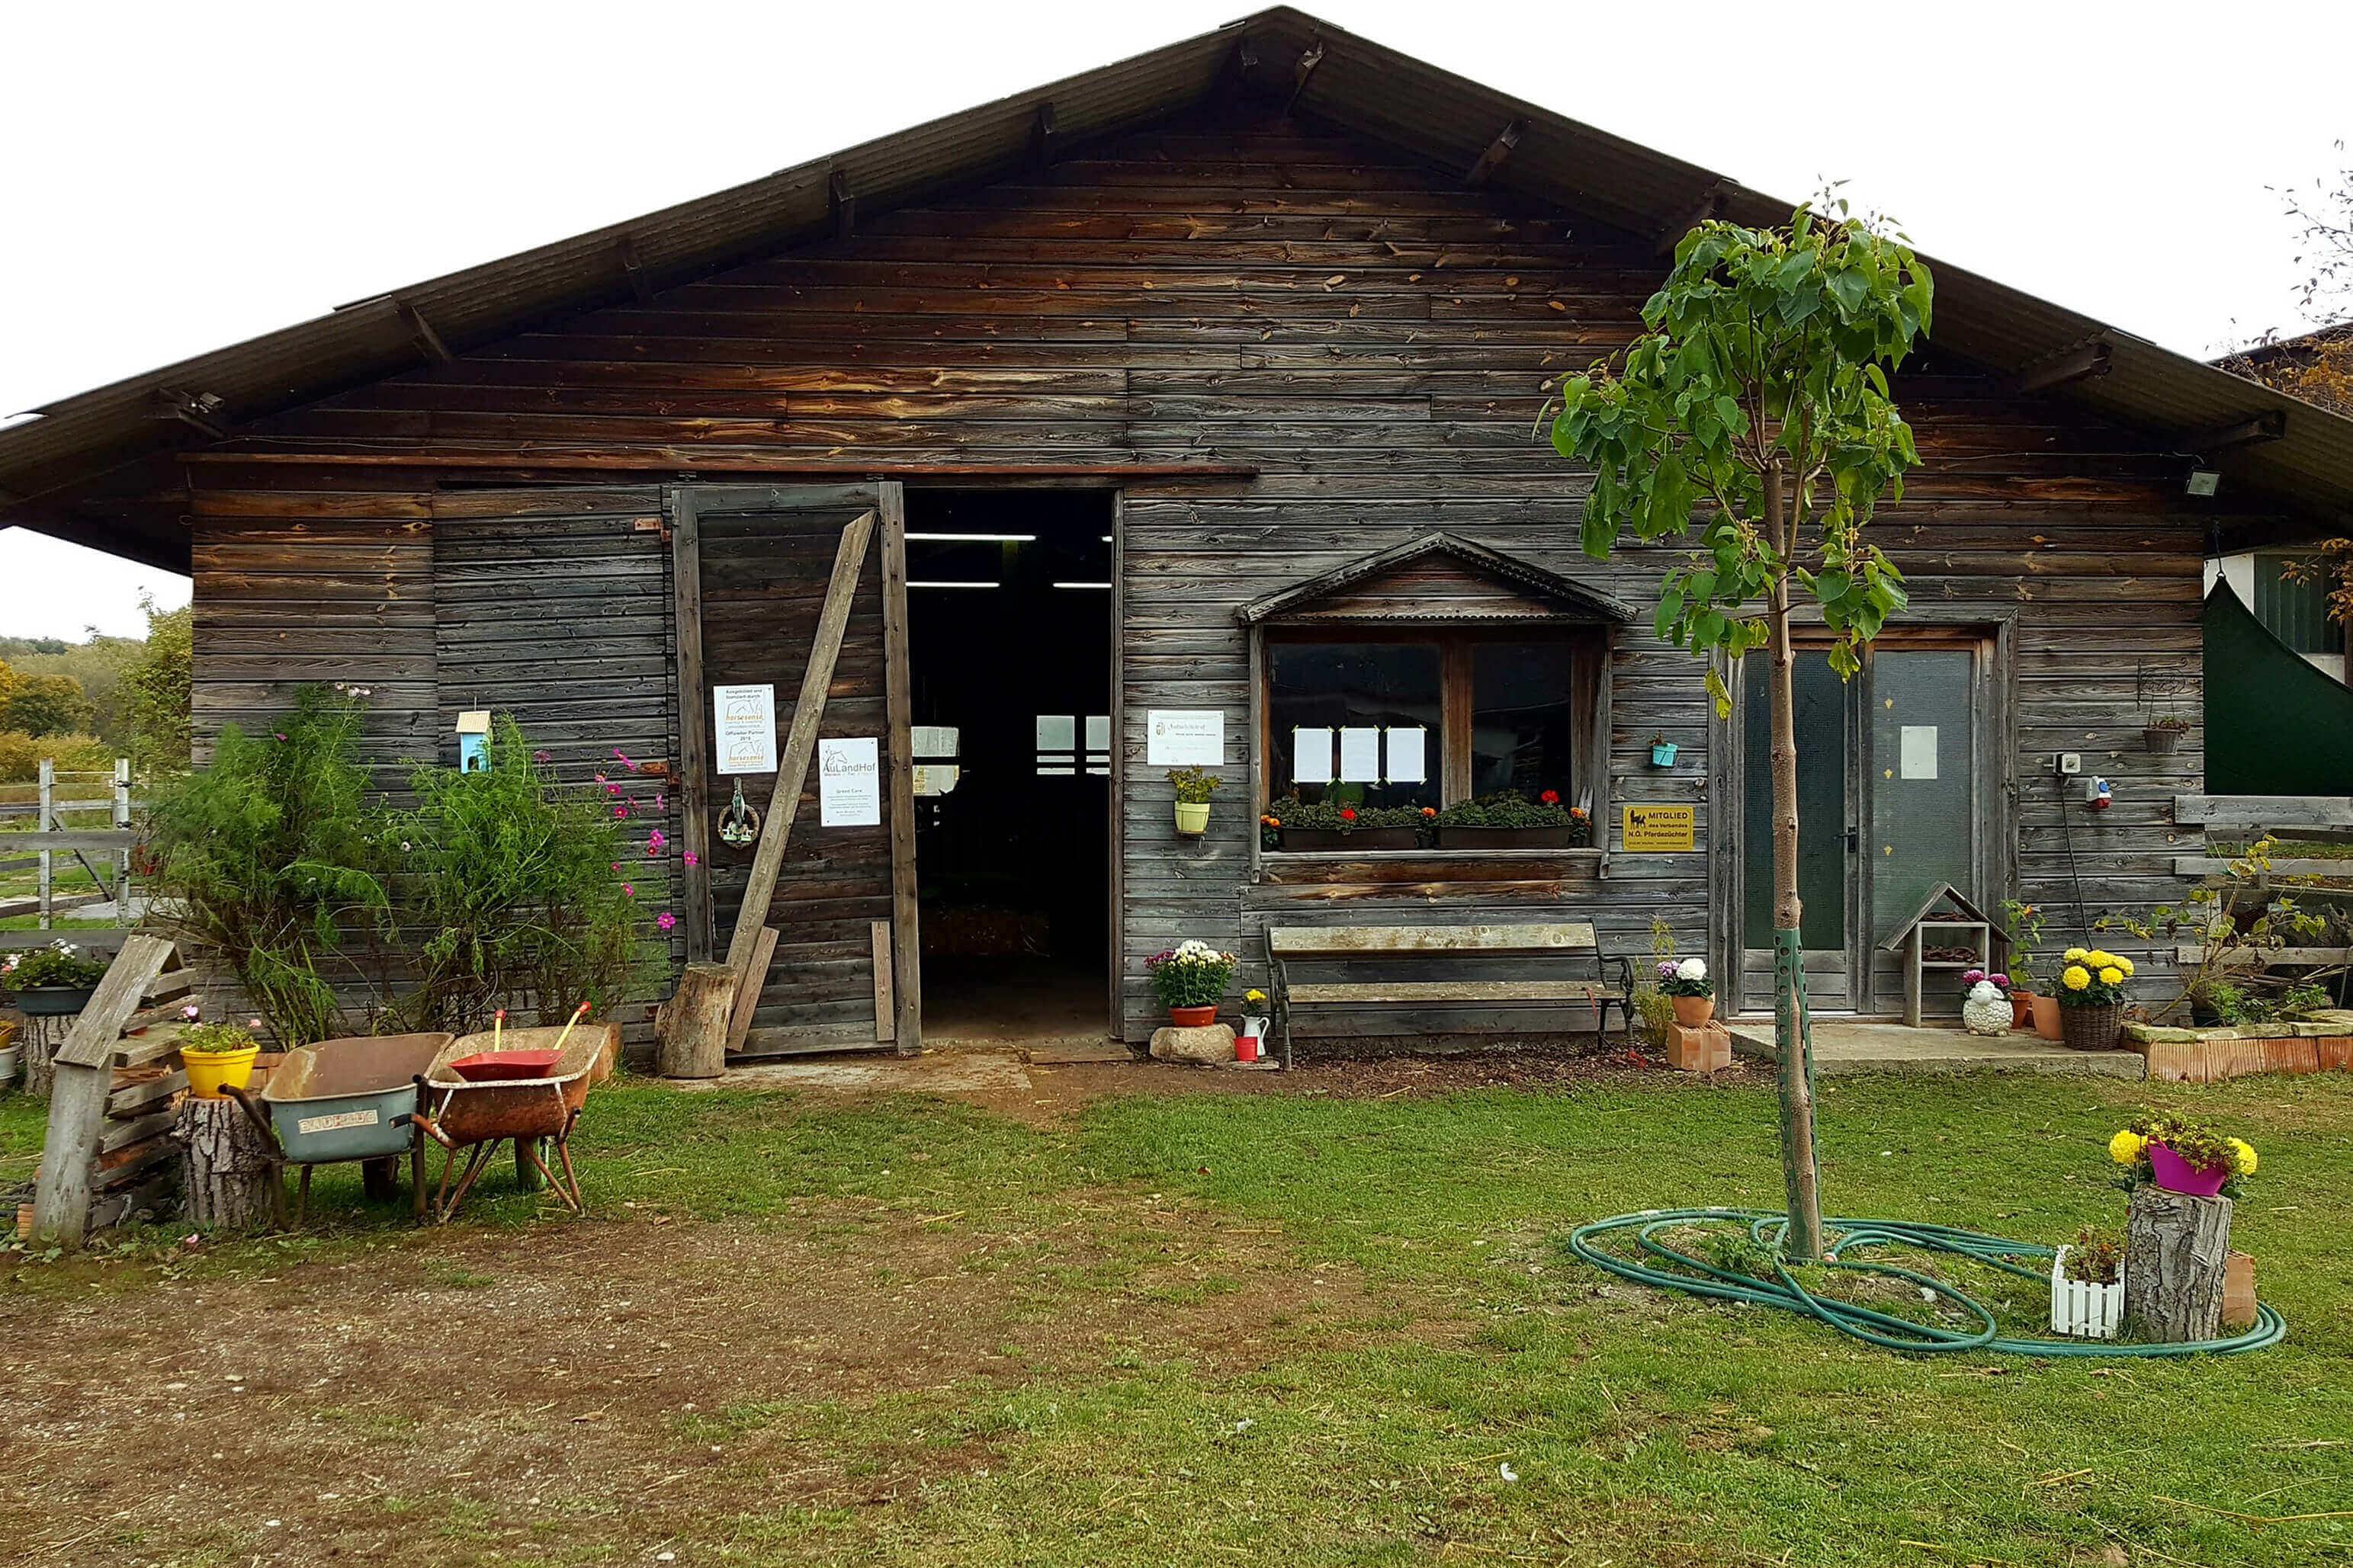 aulandhof